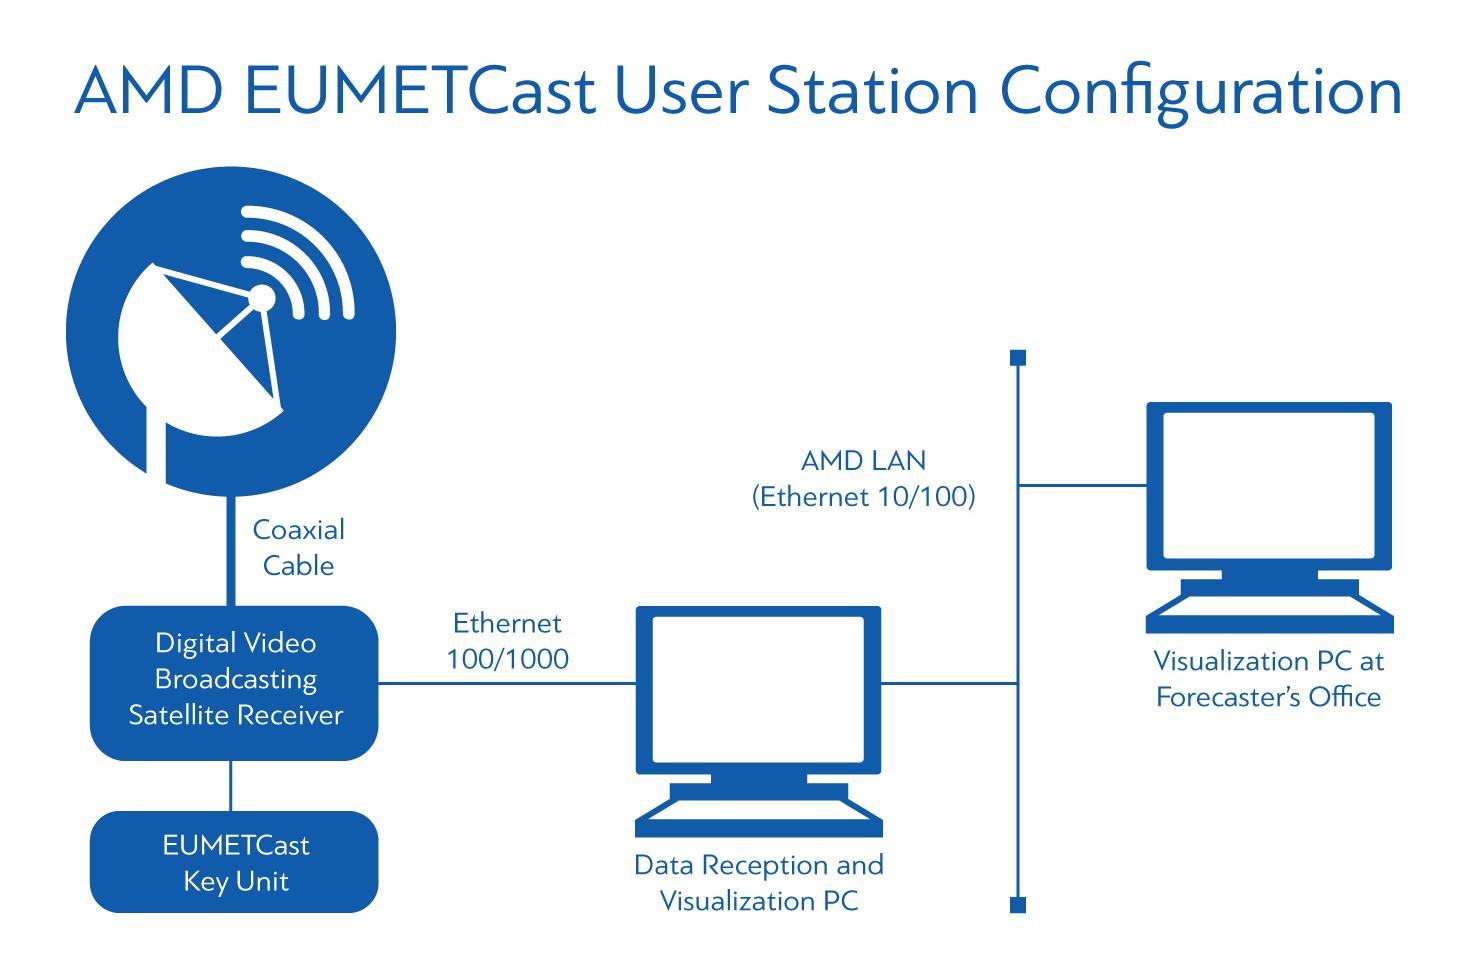 AMD Eumetcast User Station Configuration